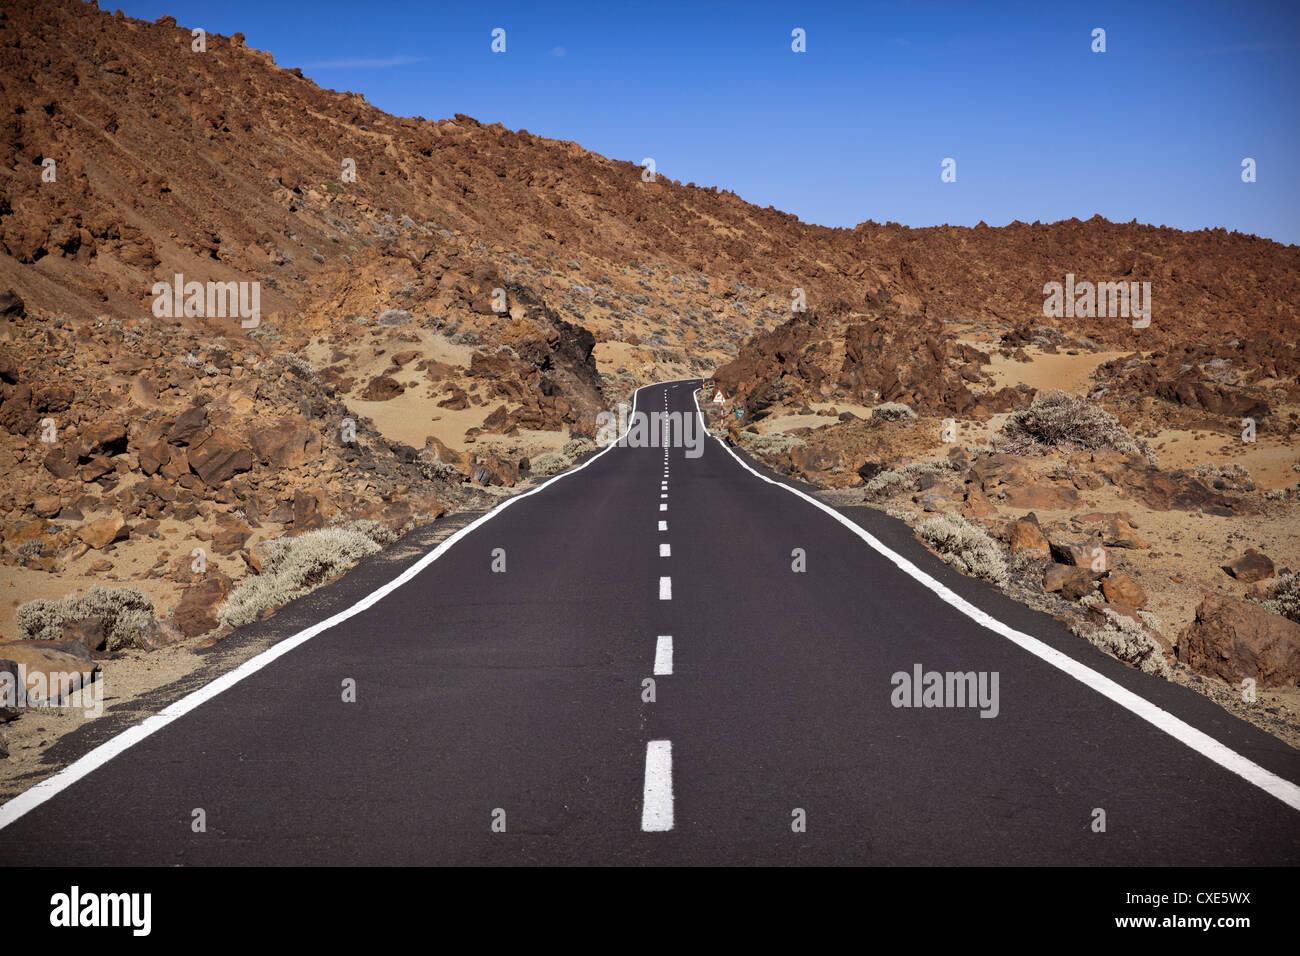 Road in El Teide National Park, UNESCO World Heritage Site, Tenerife, Canary Islands, Spain, Europe - Stock Image